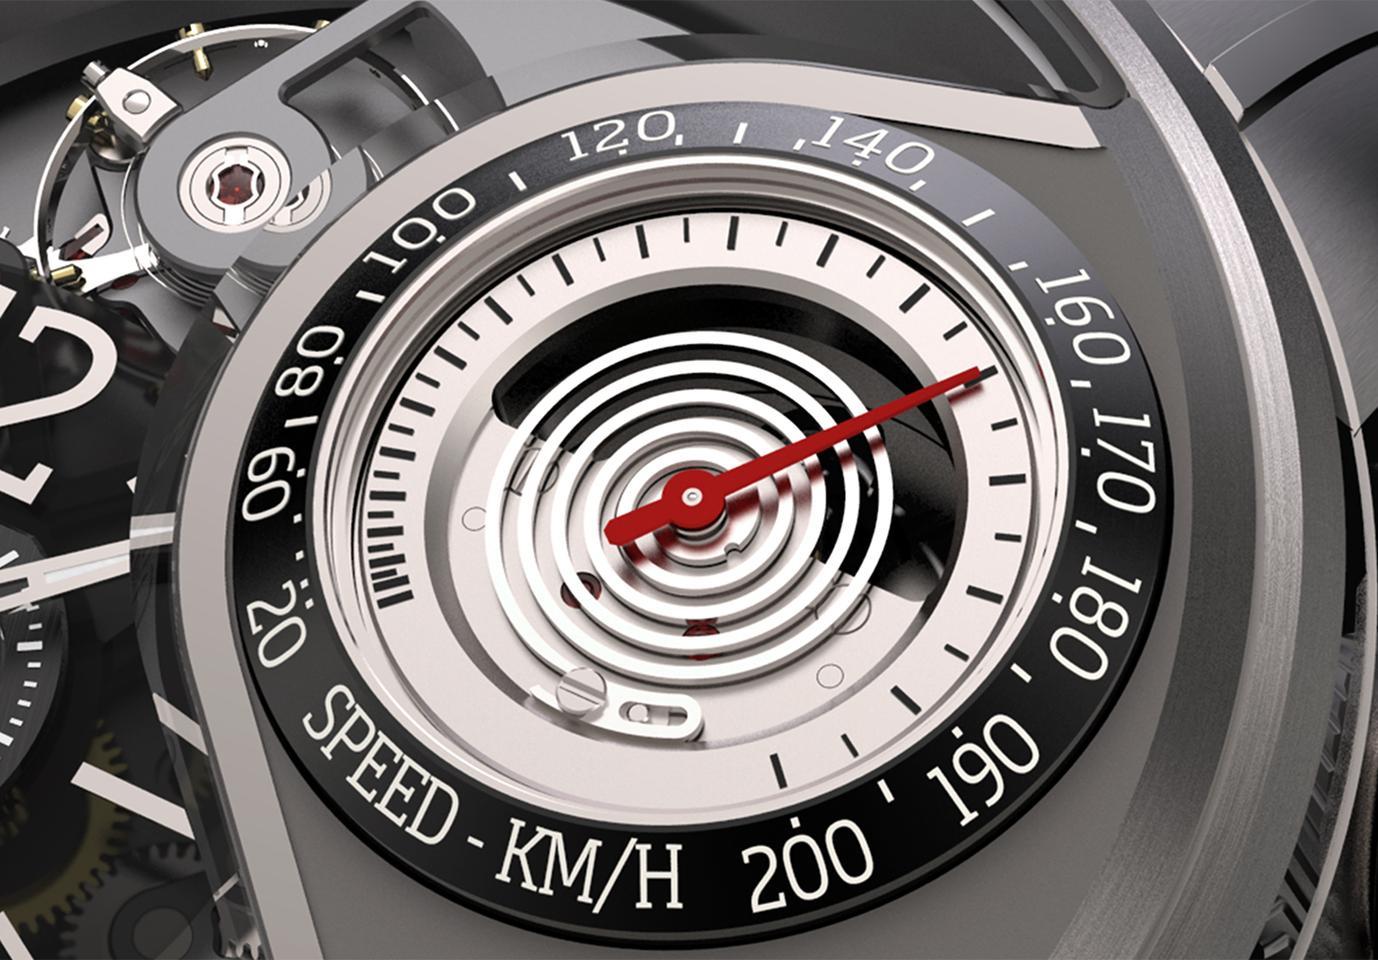 The Breva Génie 03 speedometer dial